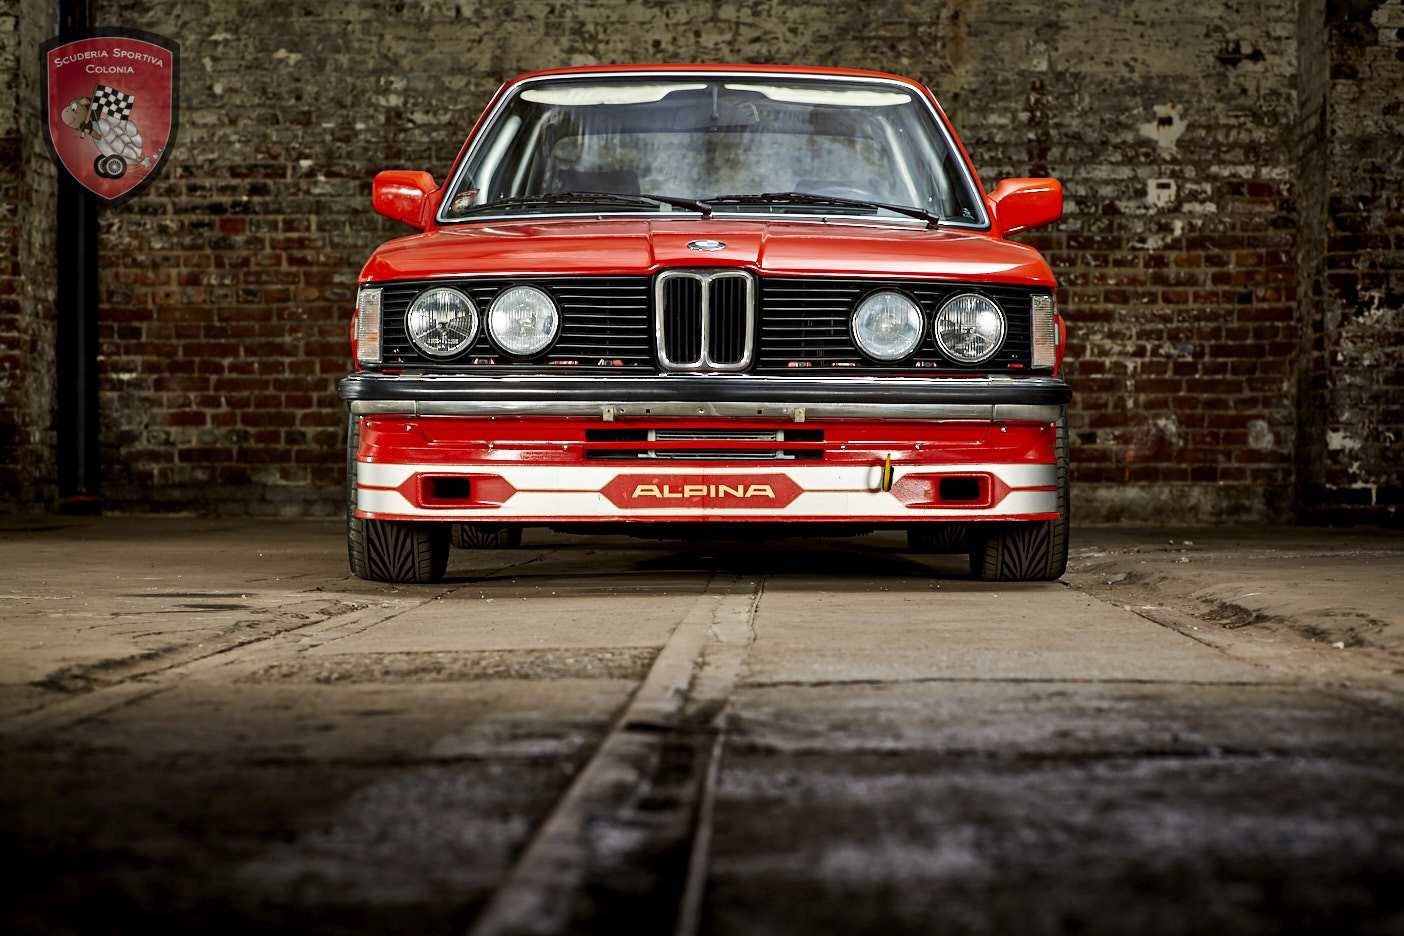 1982 BMW 323 Alpina C1 (E21) For Sale (picture 1 of 6)